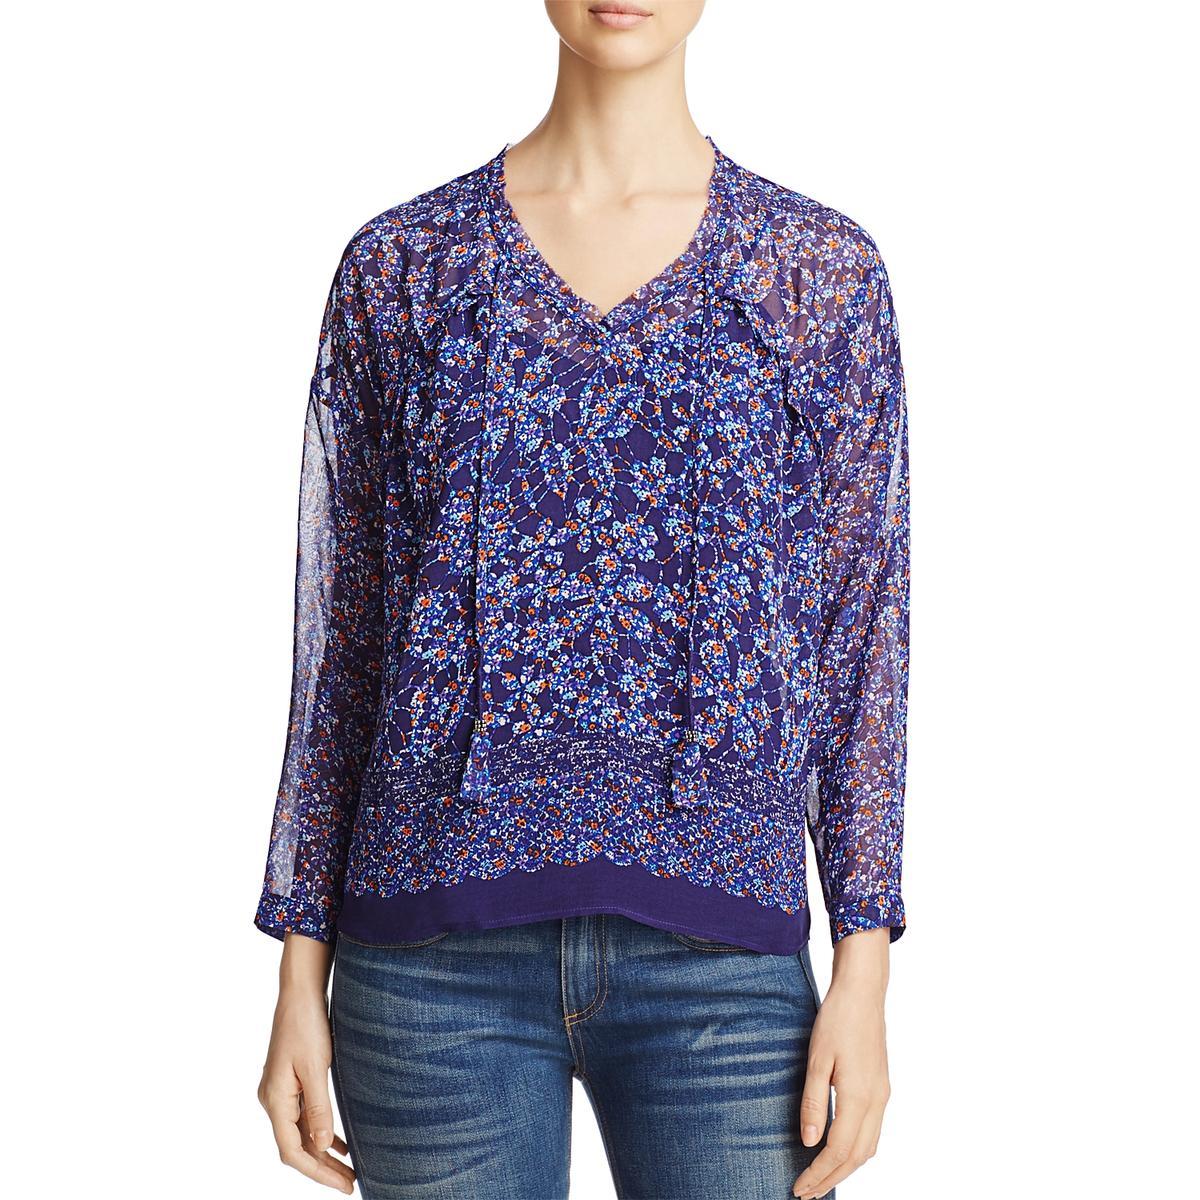 6188cd56dca894 Daniel Rainn Womens Blue Floral Ruffled Contrast Trim Blouse Top M ...